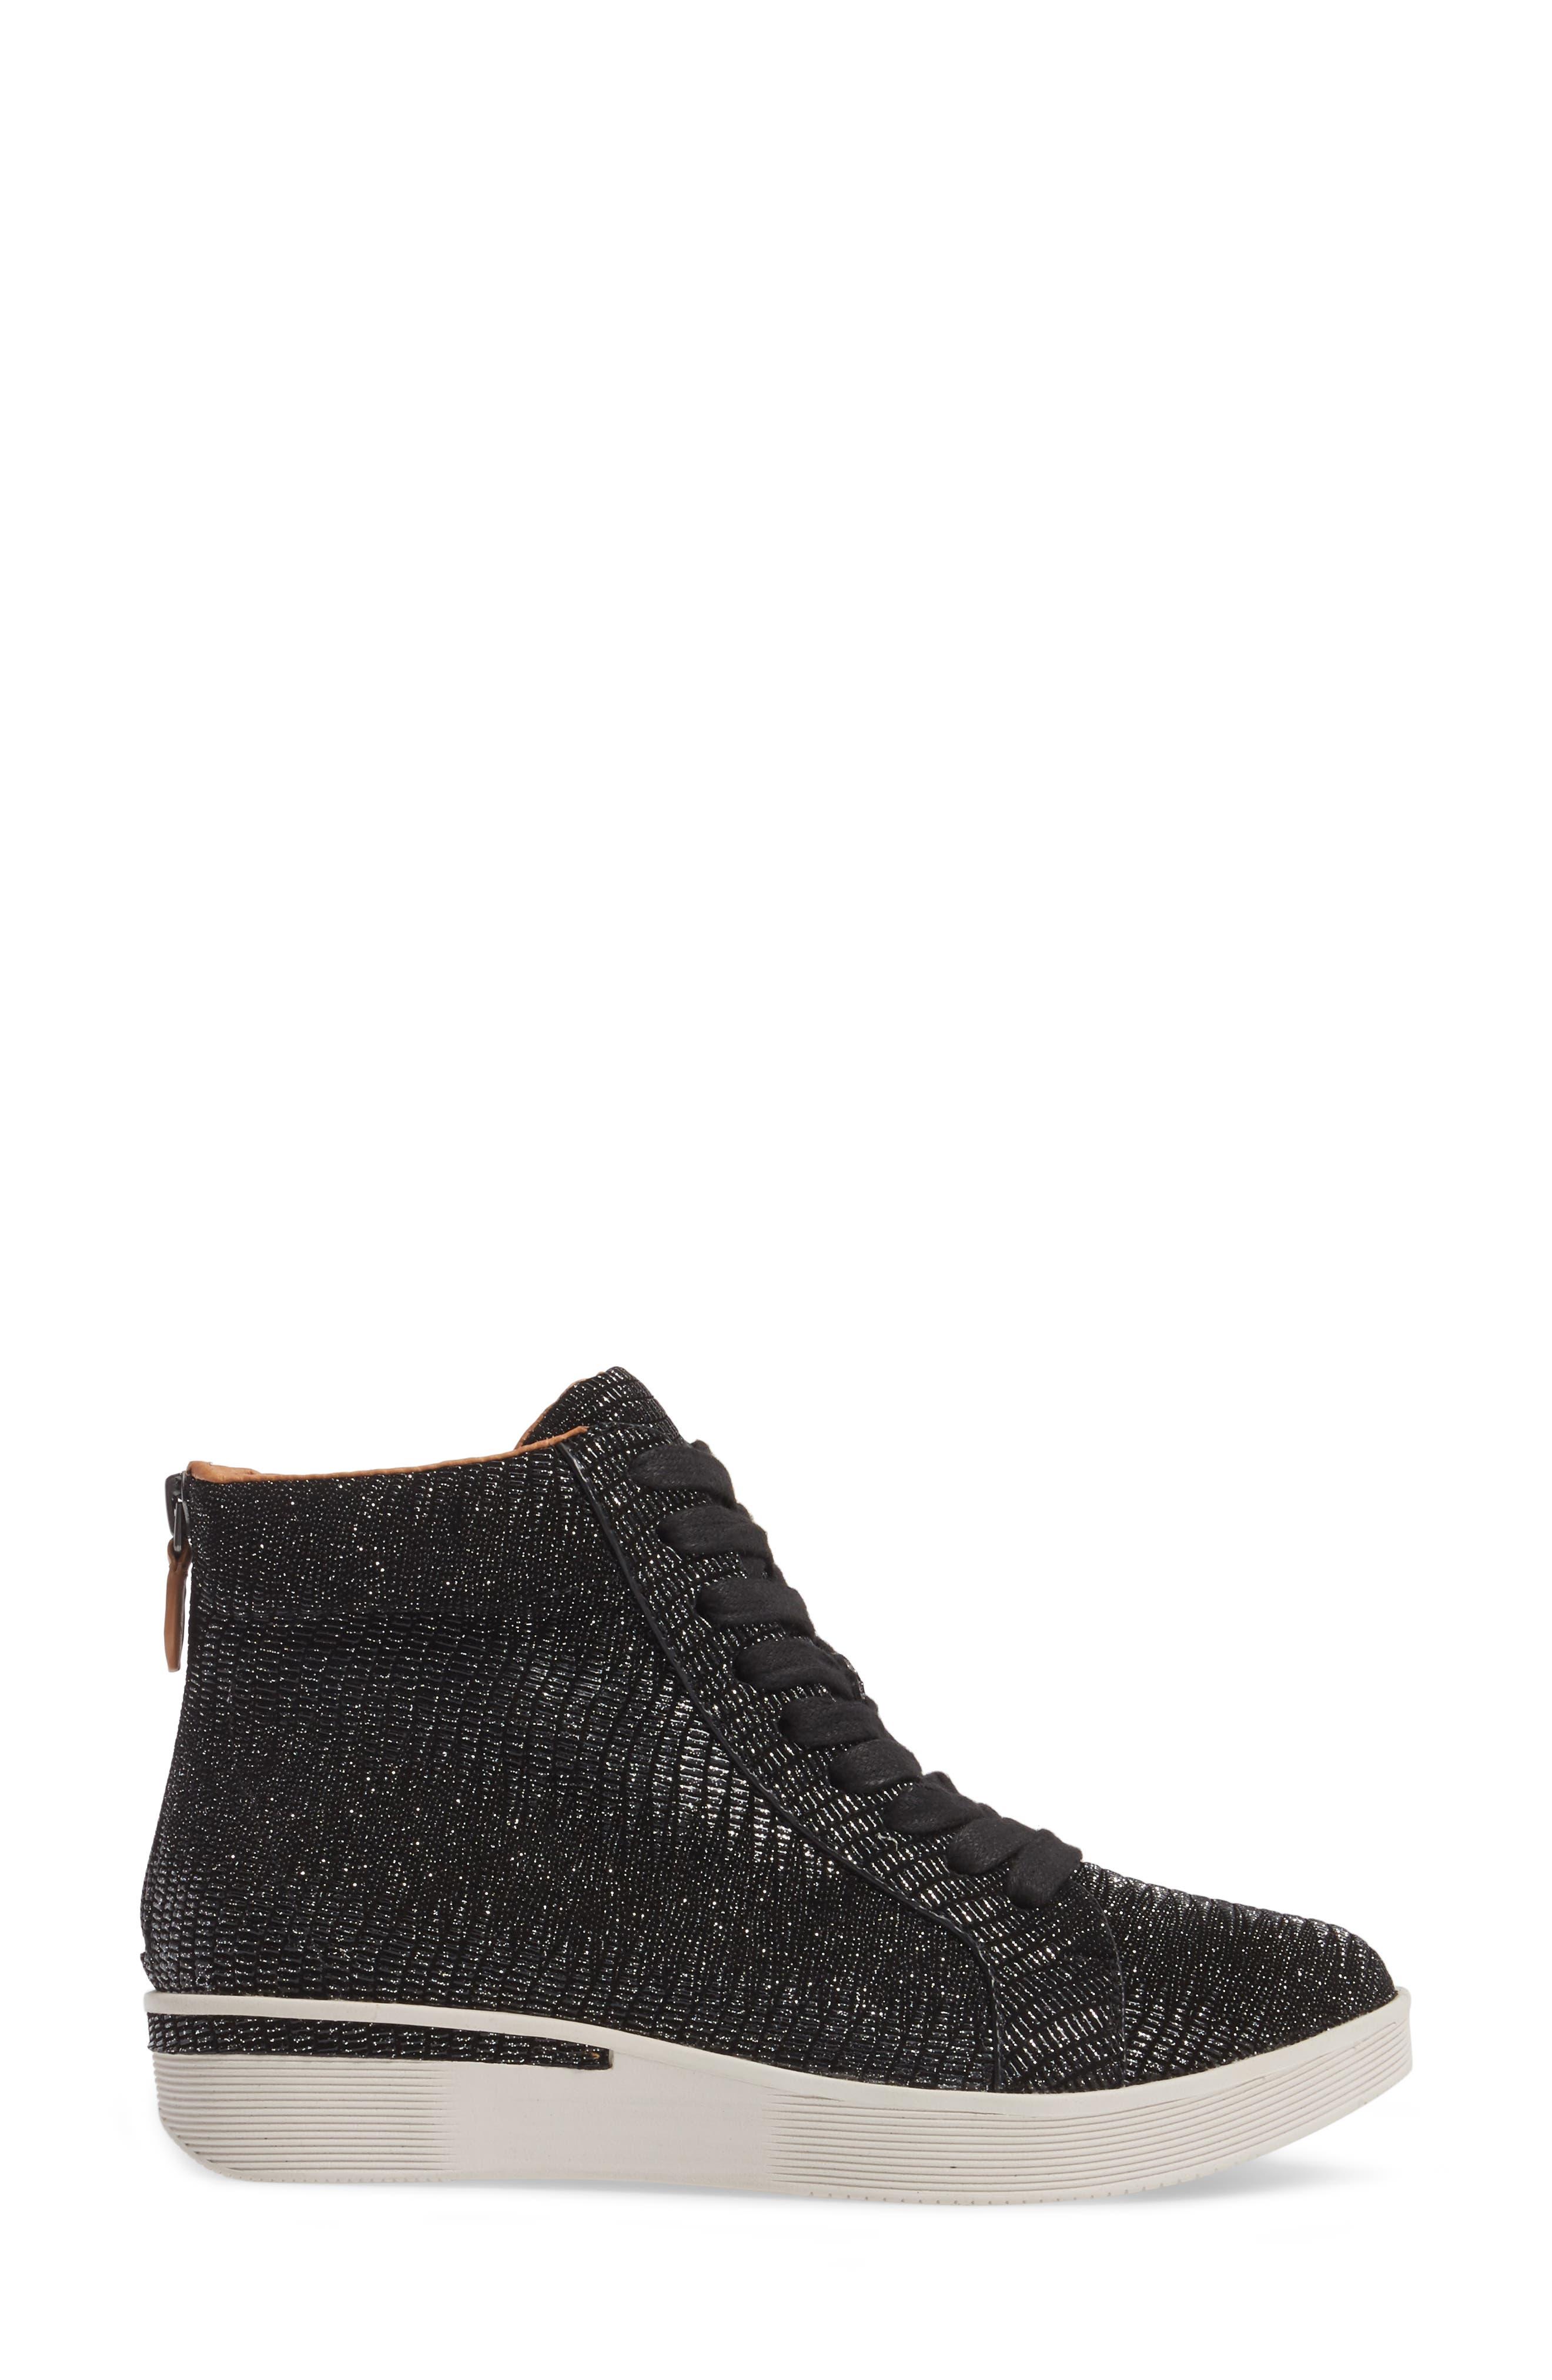 Helka High Top Sneaker,                             Alternate thumbnail 3, color,                             001